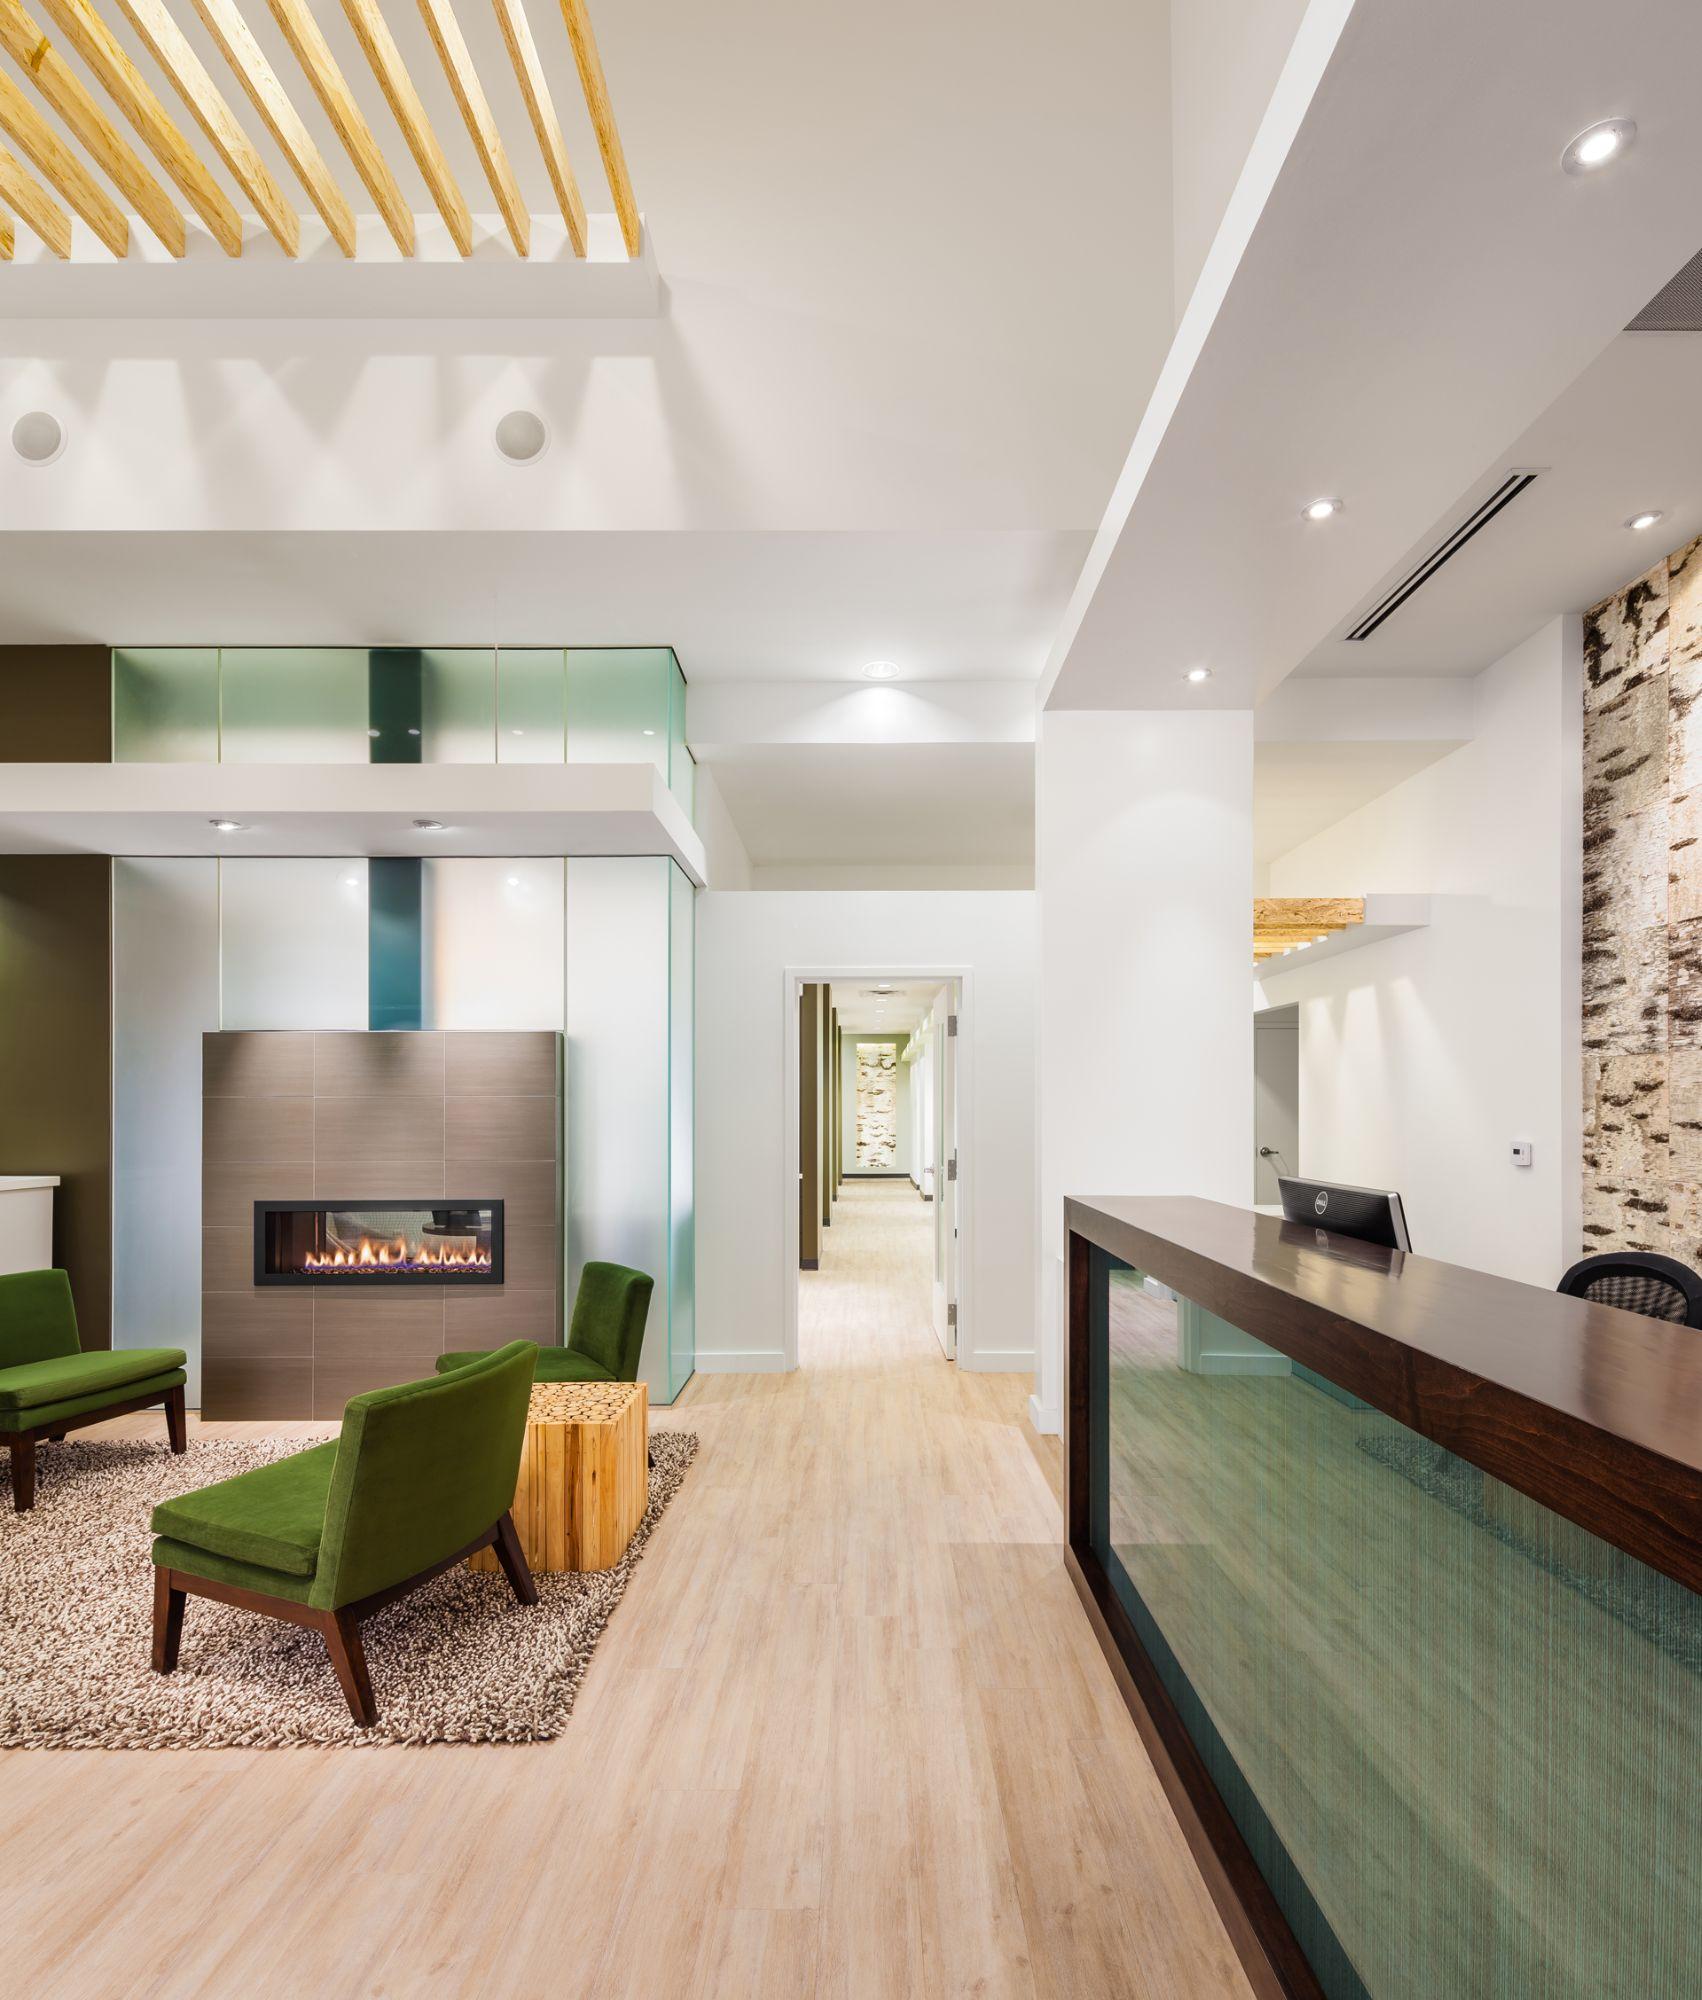 Dentistry at Golden Ridge - Fireplace